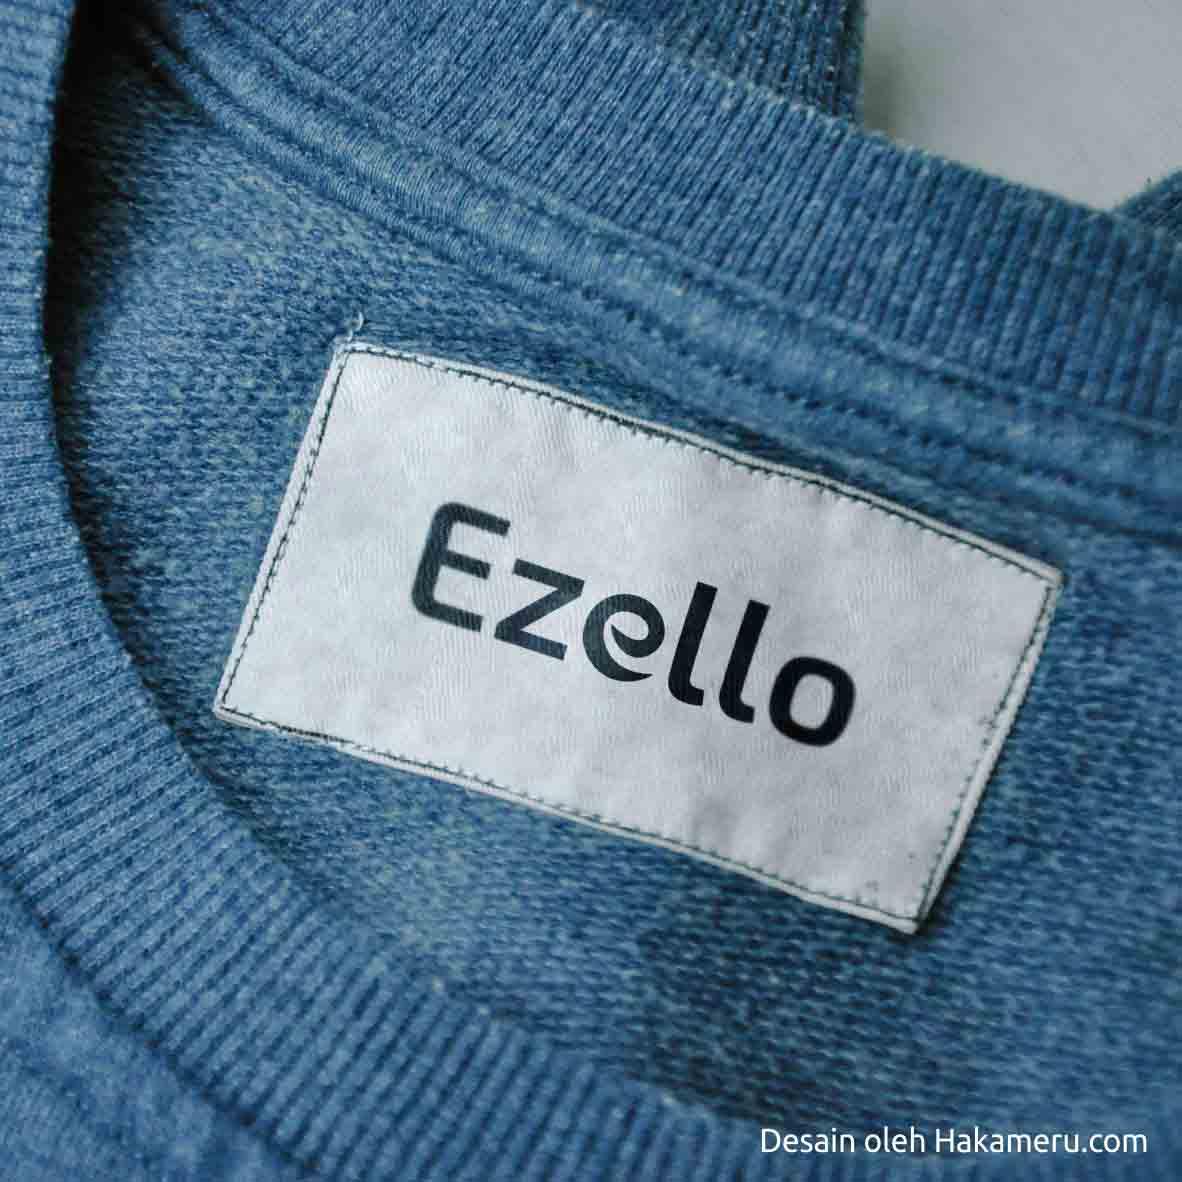 Penamaan dan desain logo untuk pakaian muslim, office wear, fashion, baju muslim santai, pakaian modest, tunik / outer - Ezello